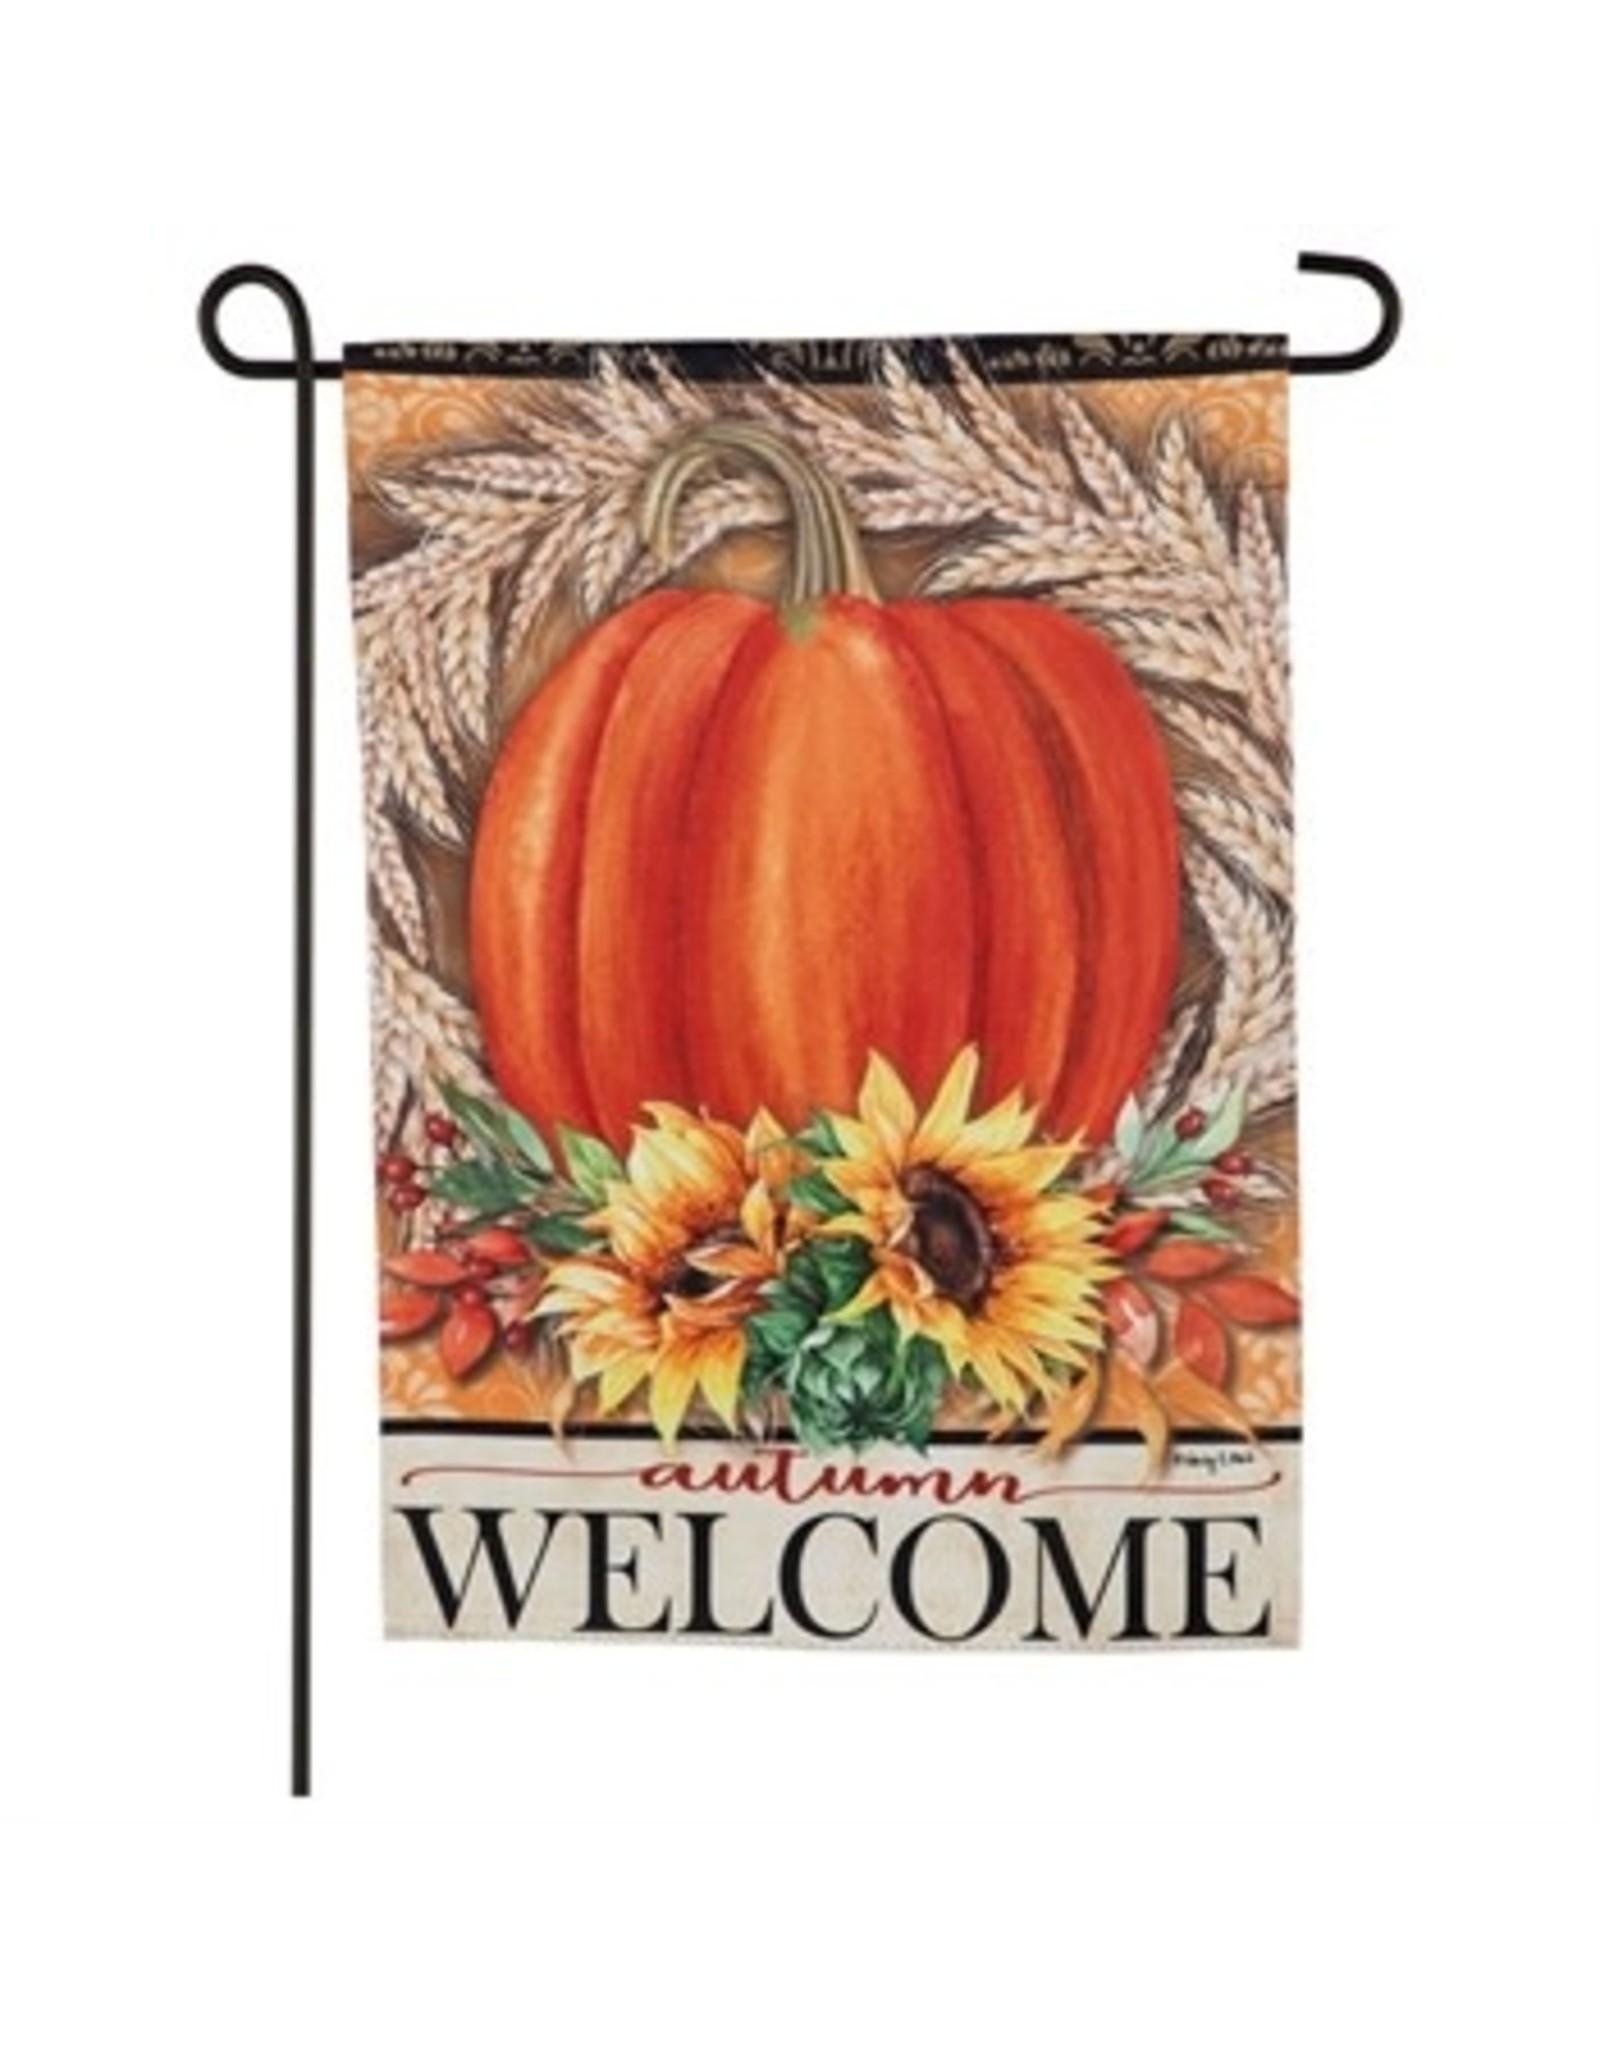 Evergreen Enterprises Festive Autumn Garden Suede Flag